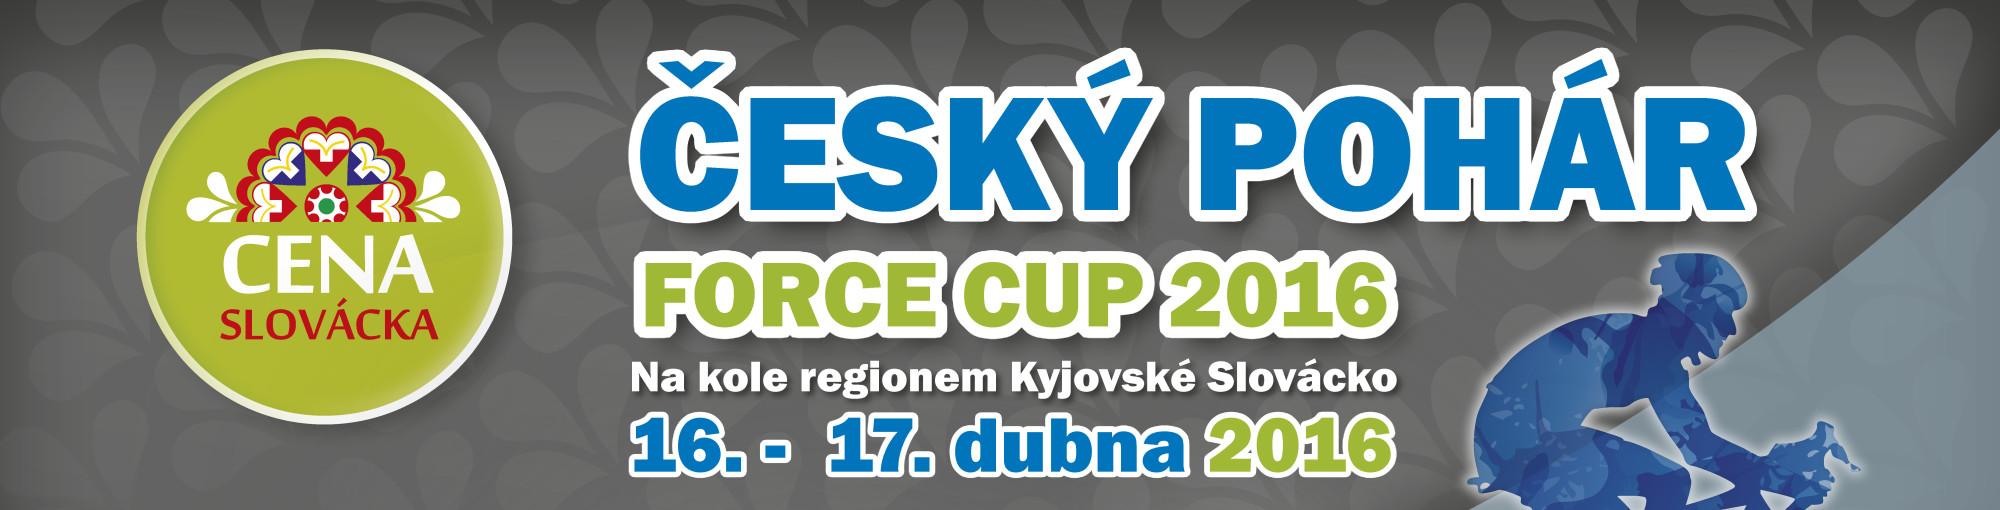 cropped-FB-Český-pohár-2016.jpg